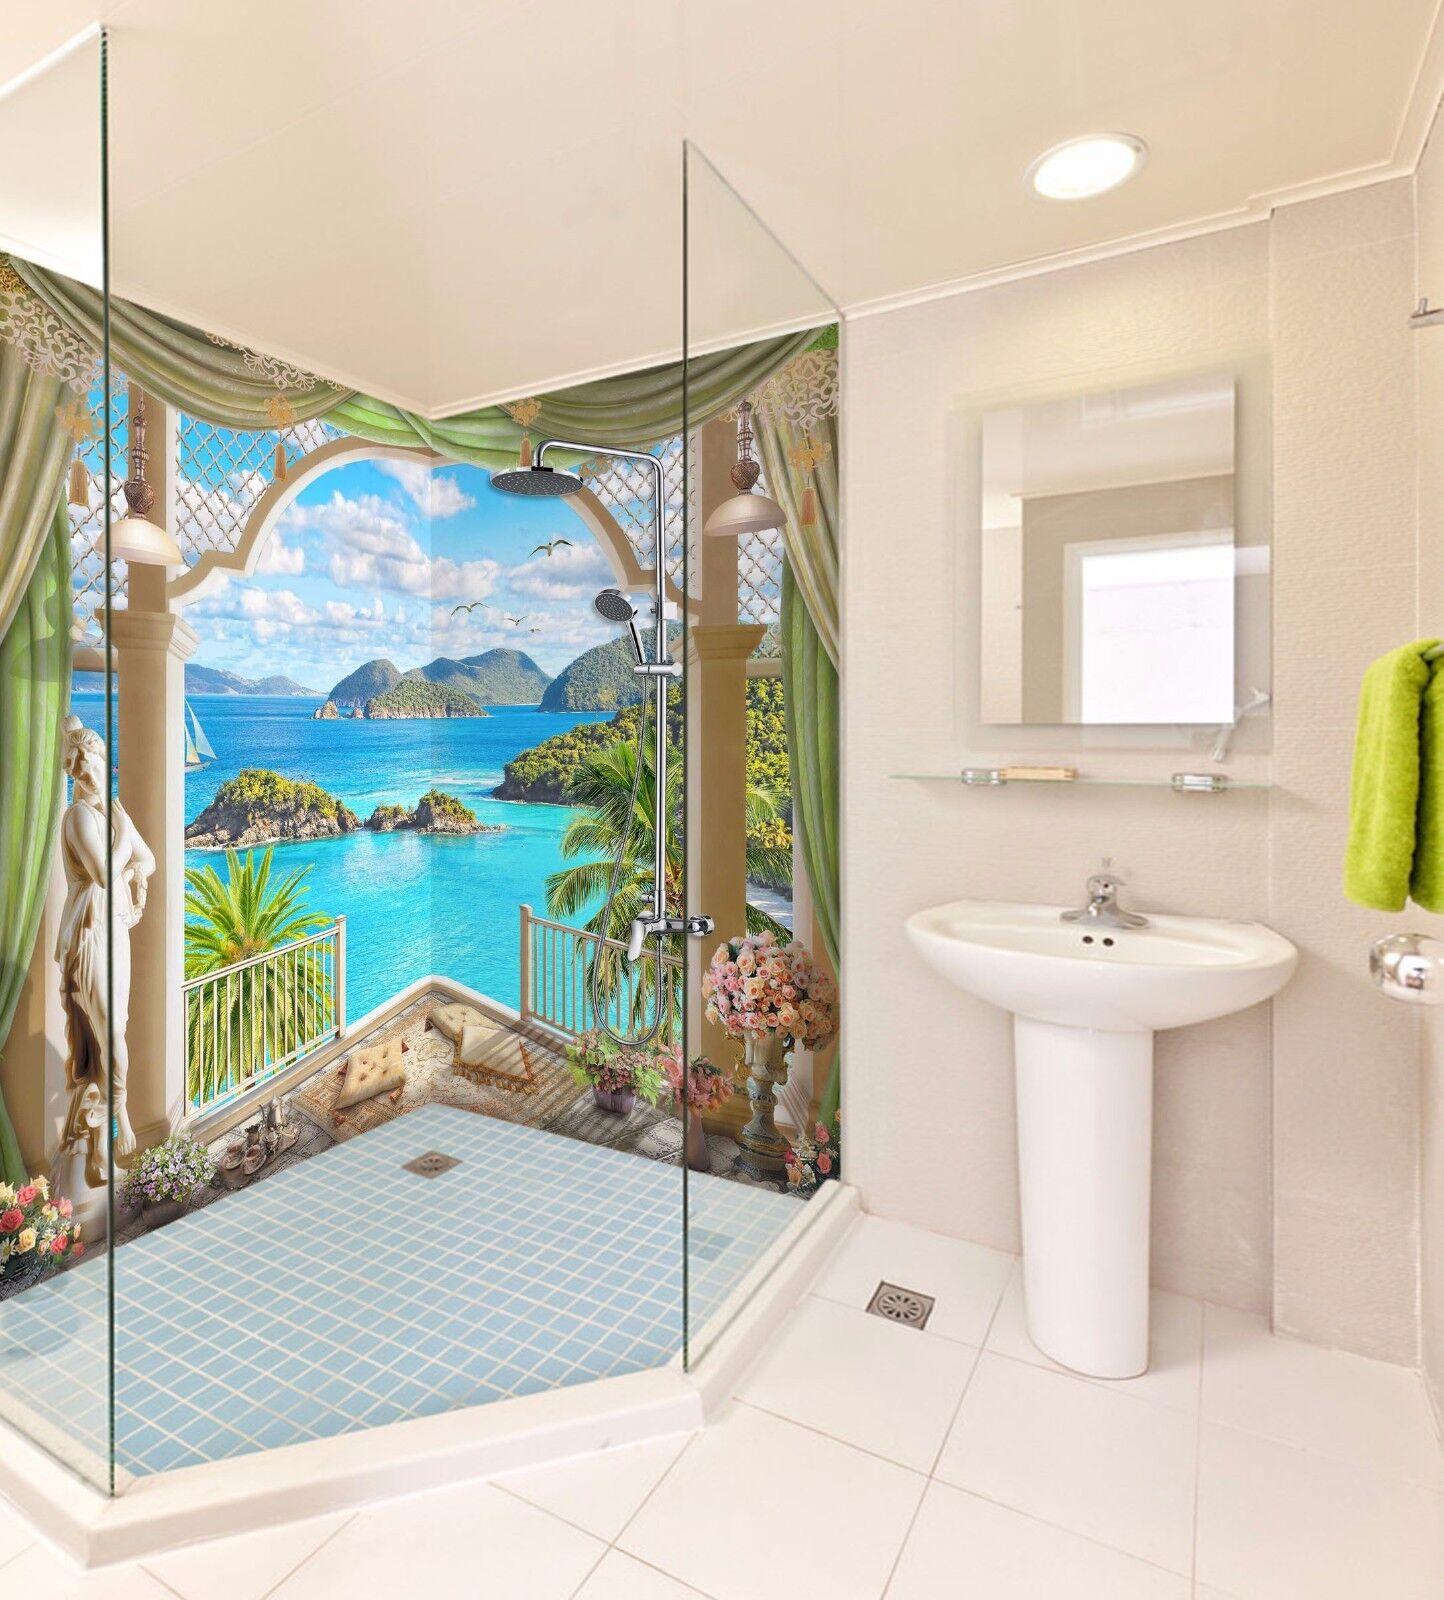 3D Window 7034  WallPaper Bathroom Print Decal Wall Deco AJ WALLPAPER AU